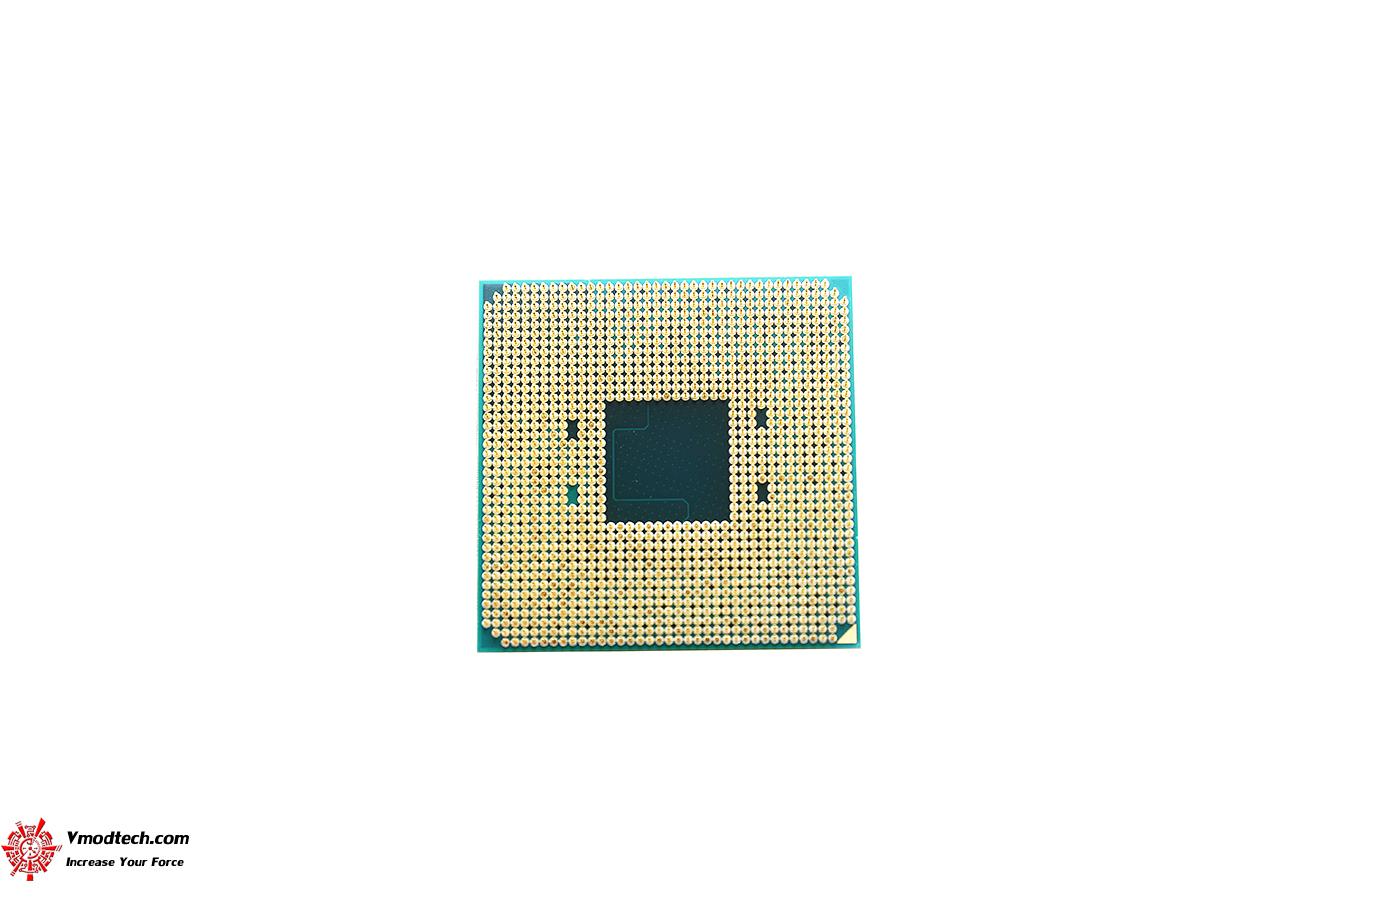 dsc 9699 AMD Athlon 220GE Processor with Radeon Vega 3 Graphics Review